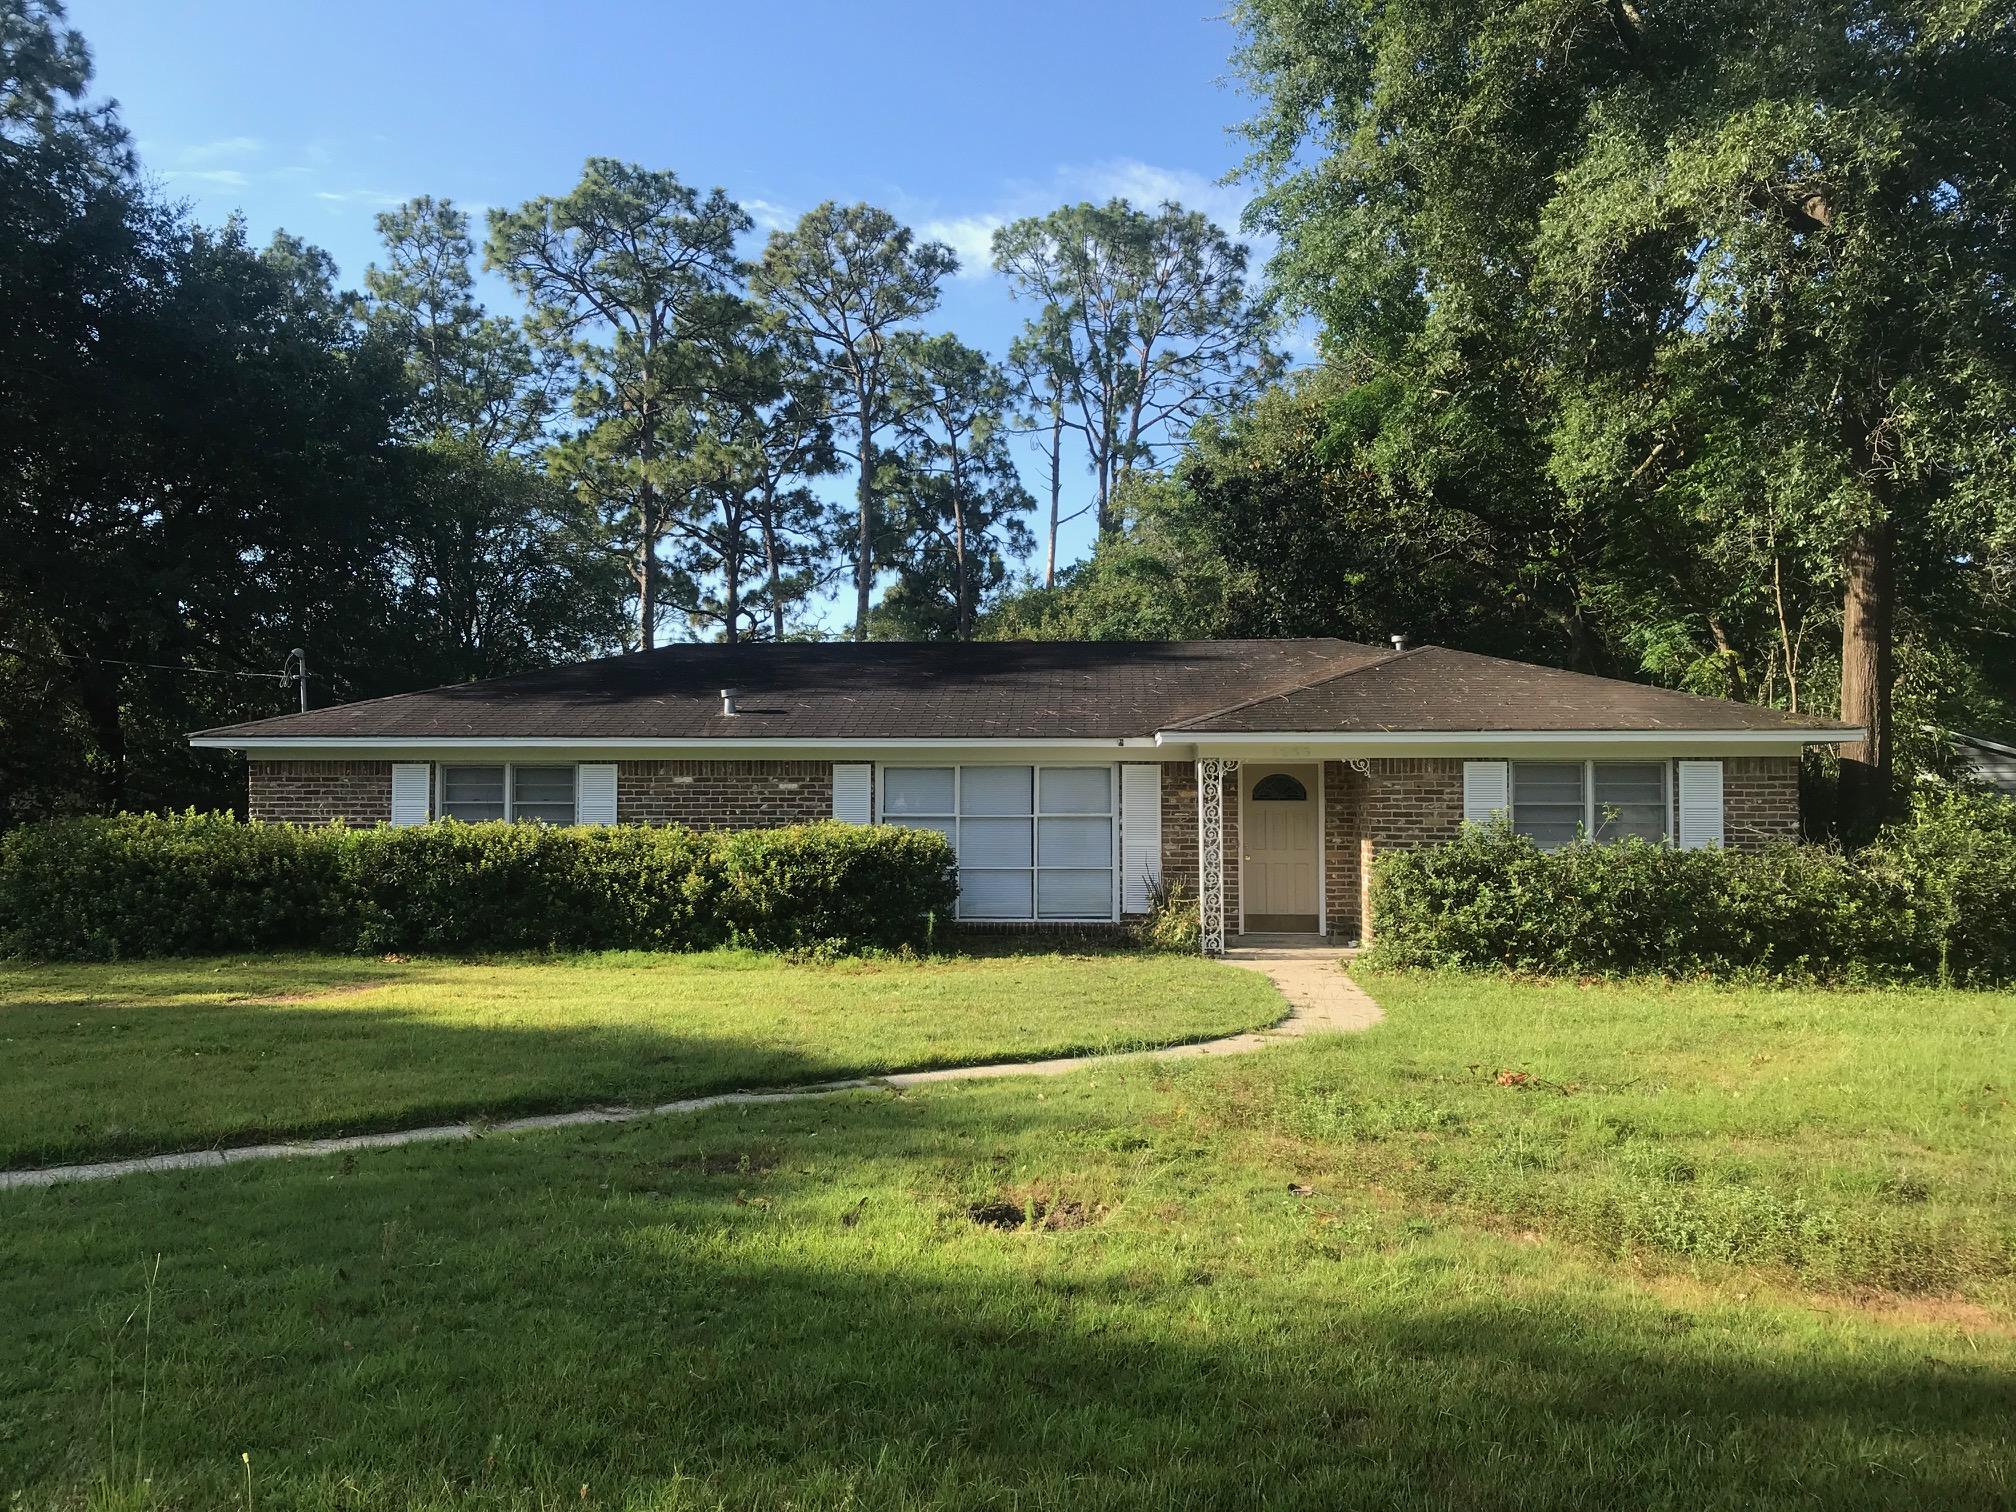 251 Properties - Rentals   Mobile   Alabama   House Rentals